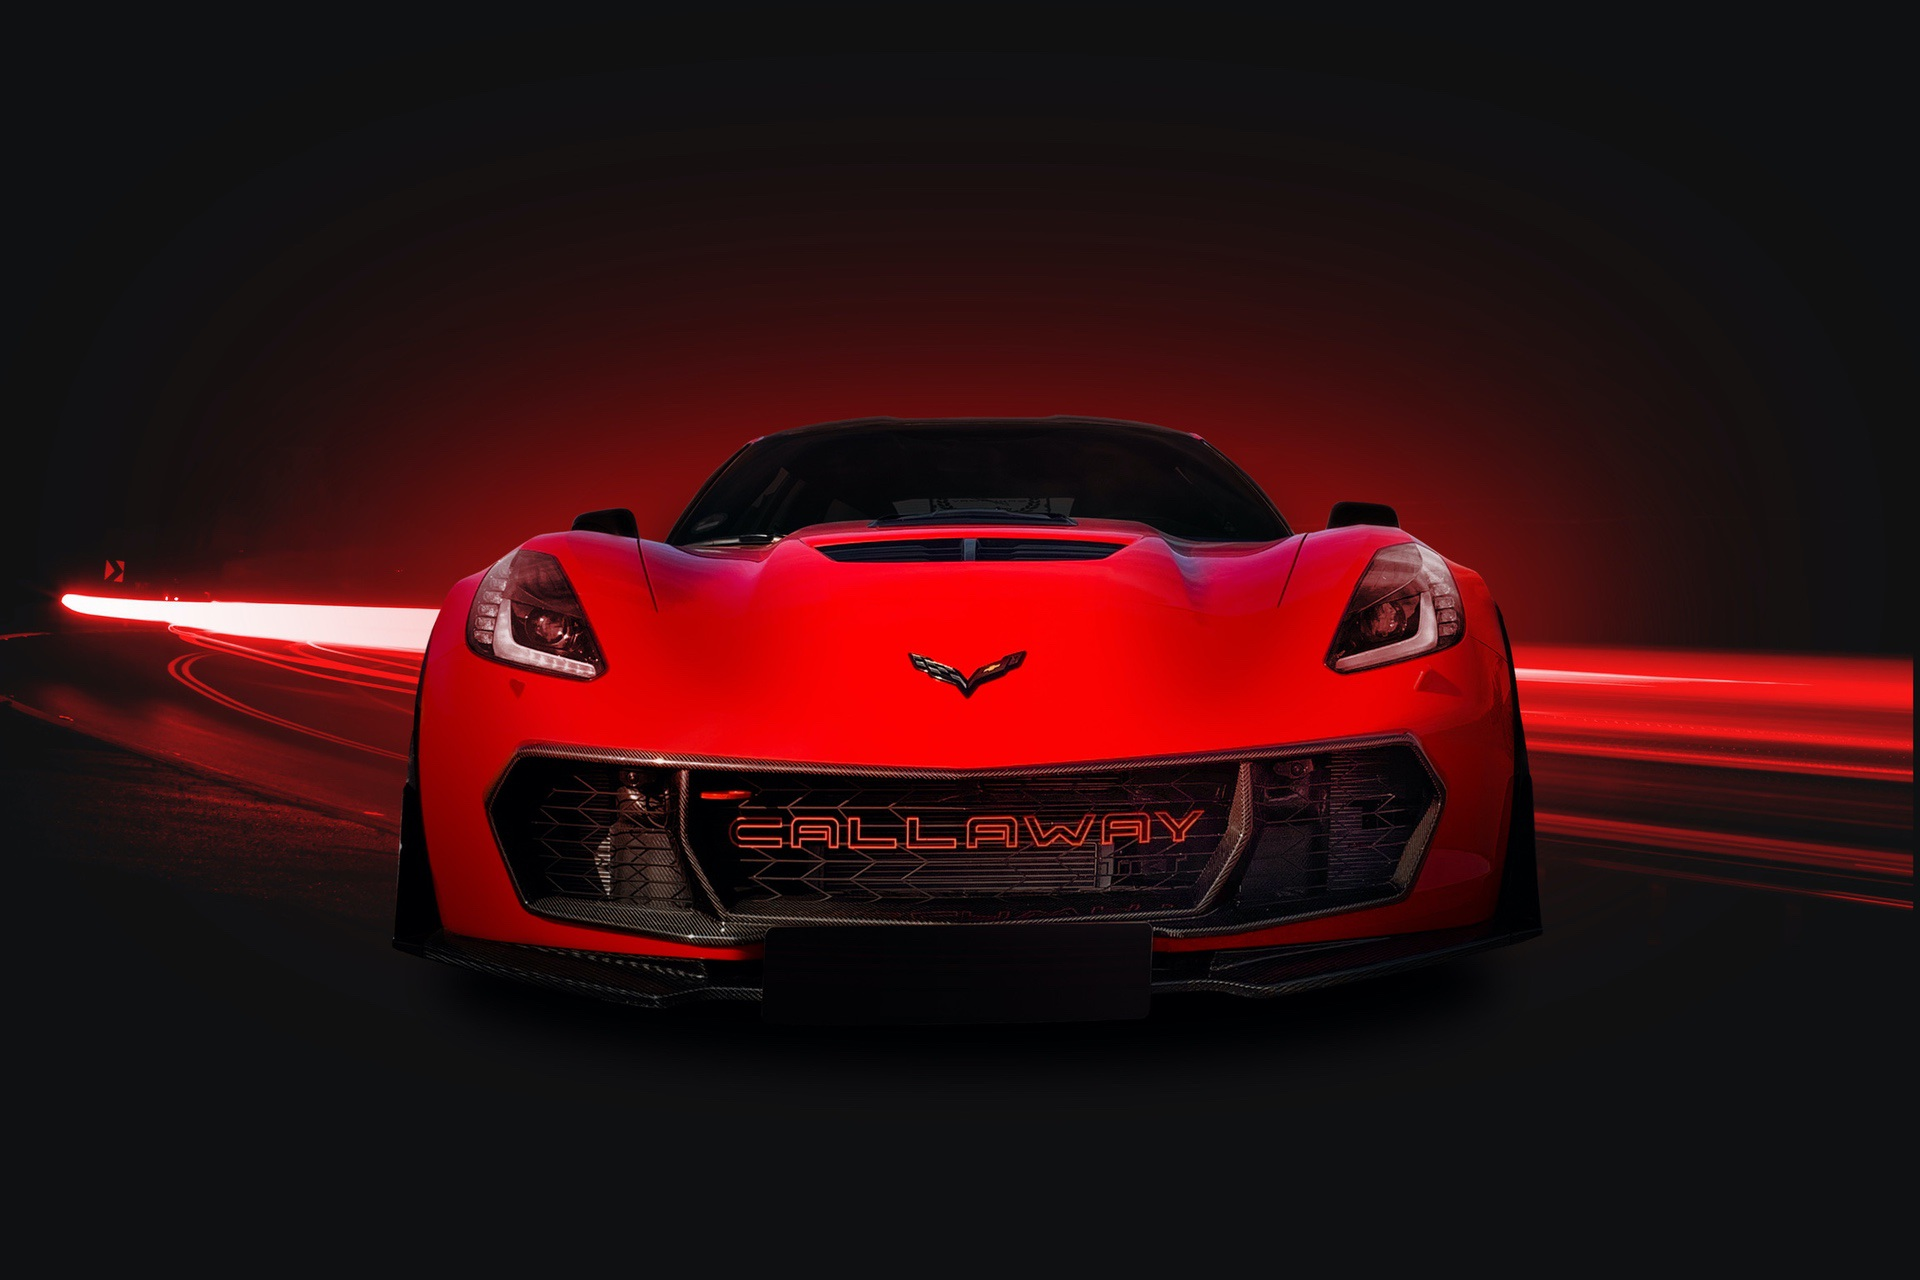 Callaway_C7_Corvette_limited_edition_0005